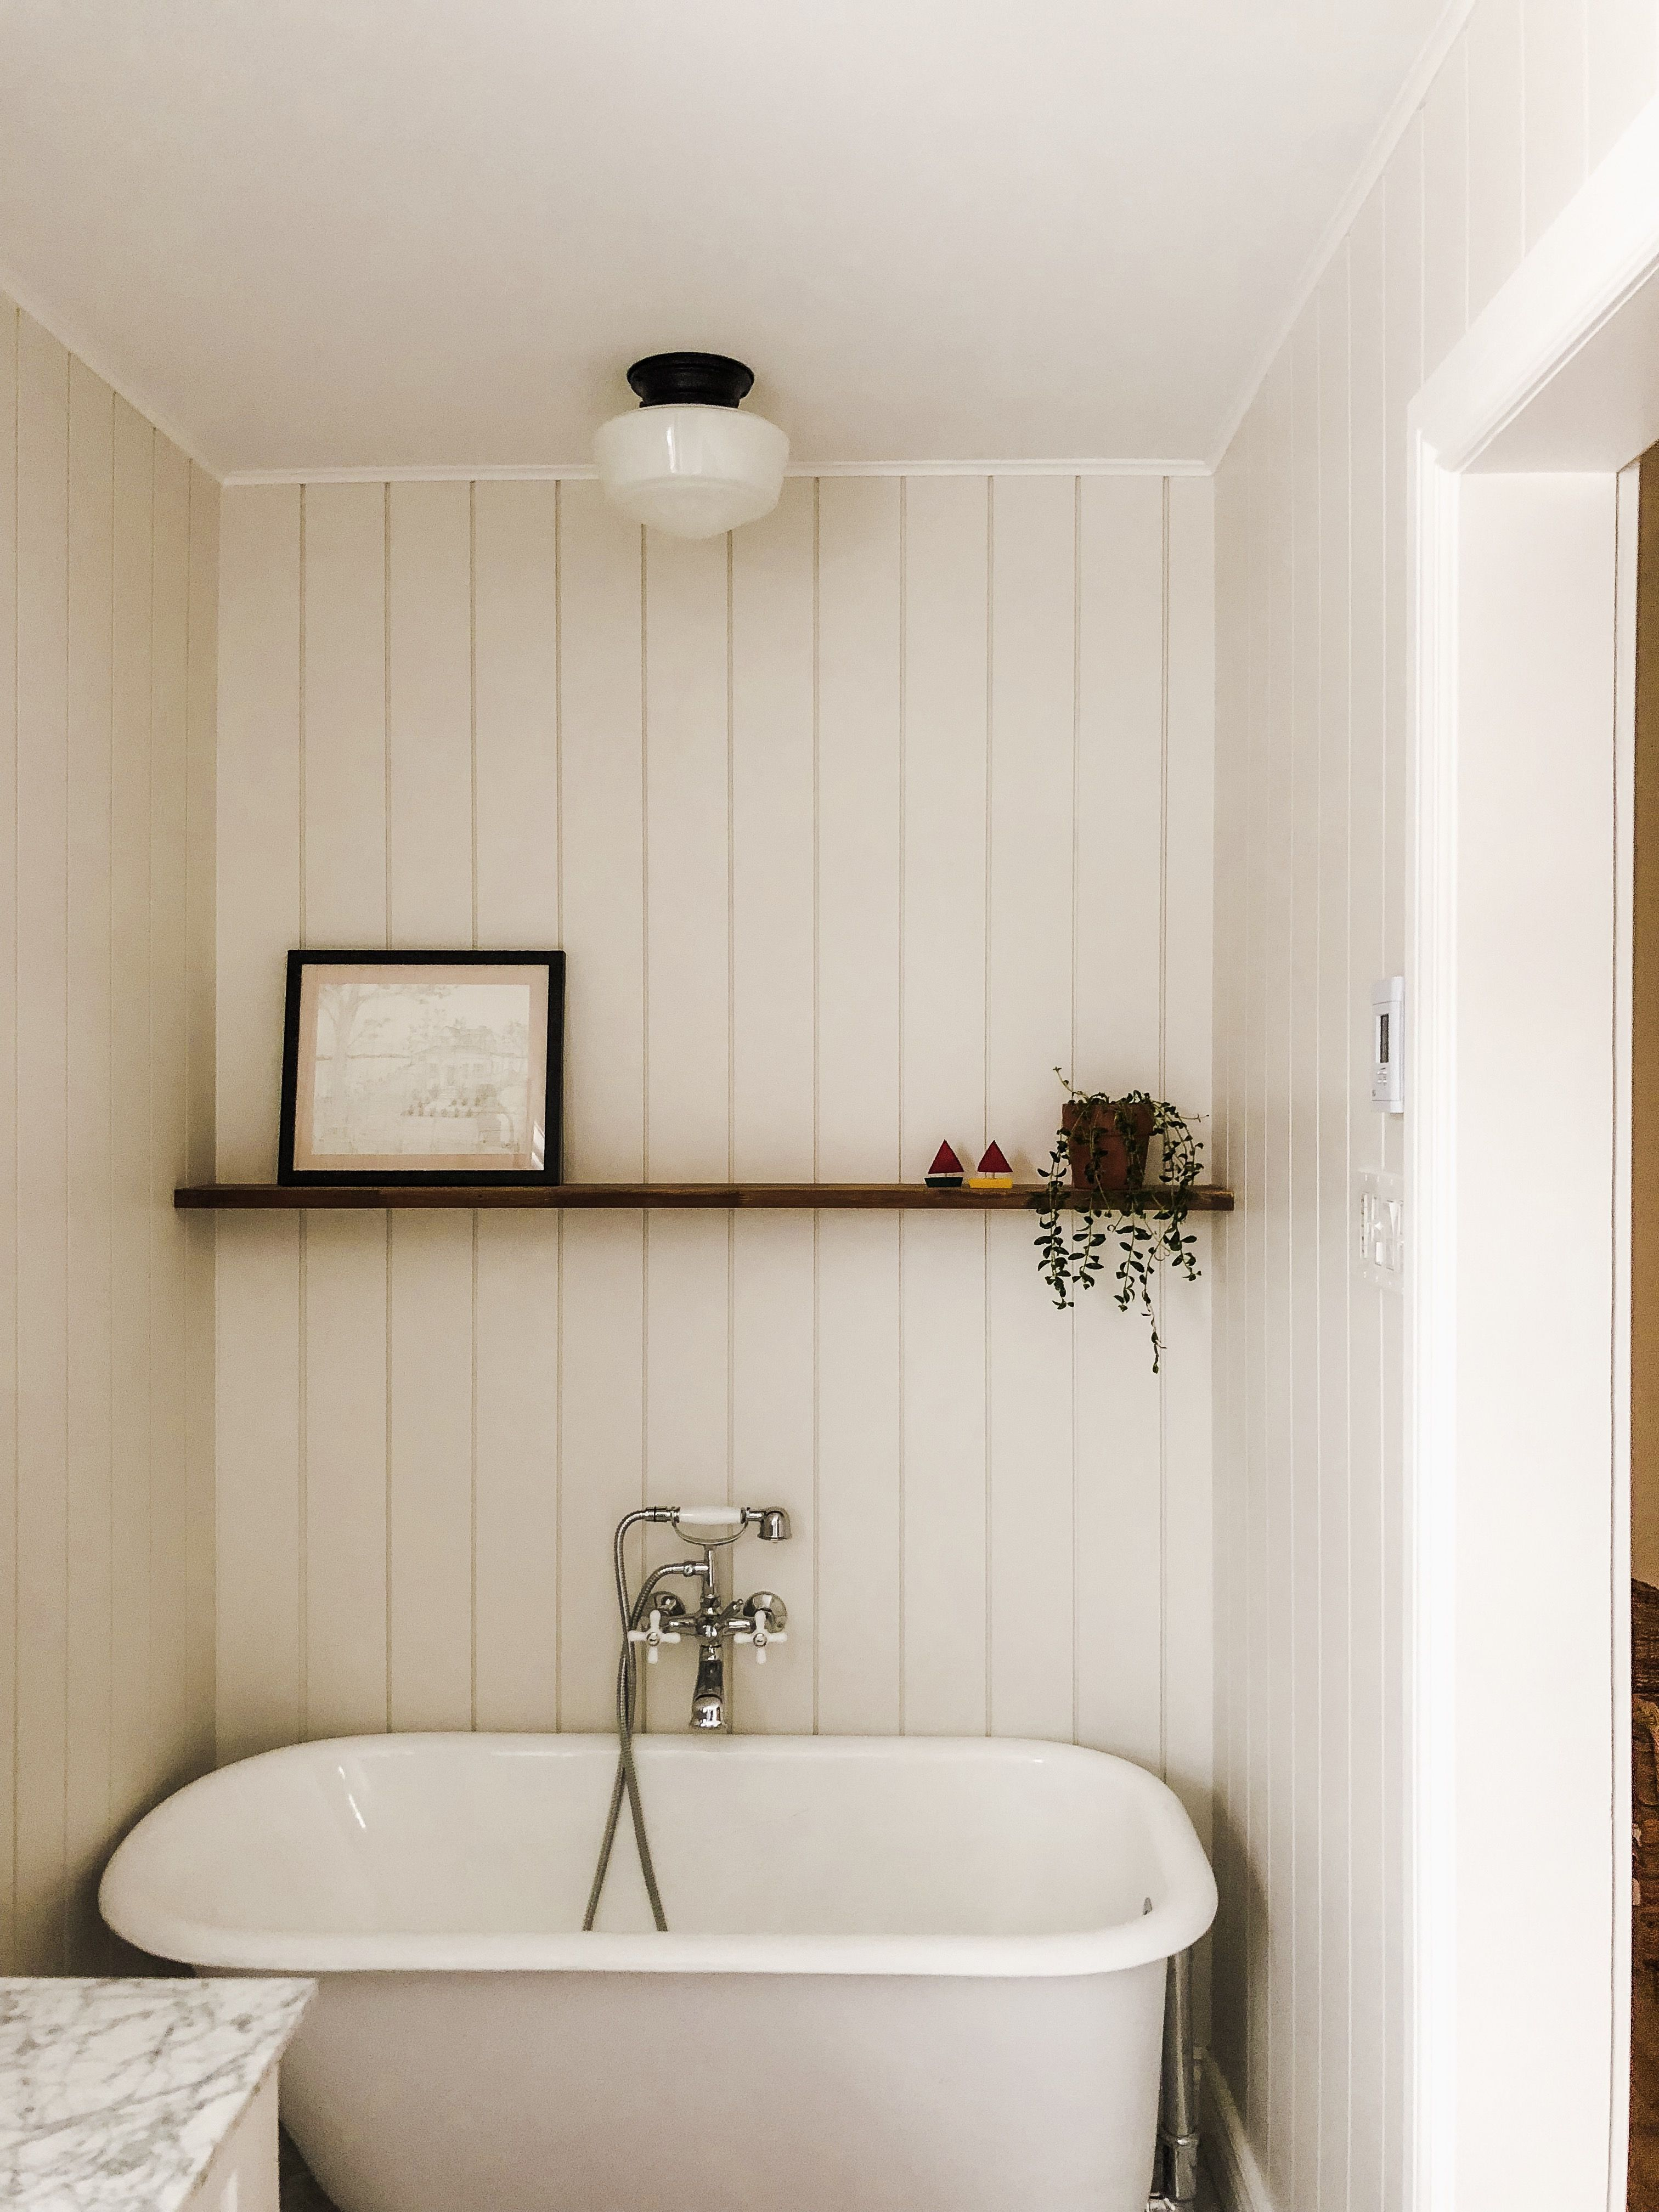 Pin By Michael Sakas On Columbus Courtyard Home Home Decor Inspiration Bathroom Inspiration